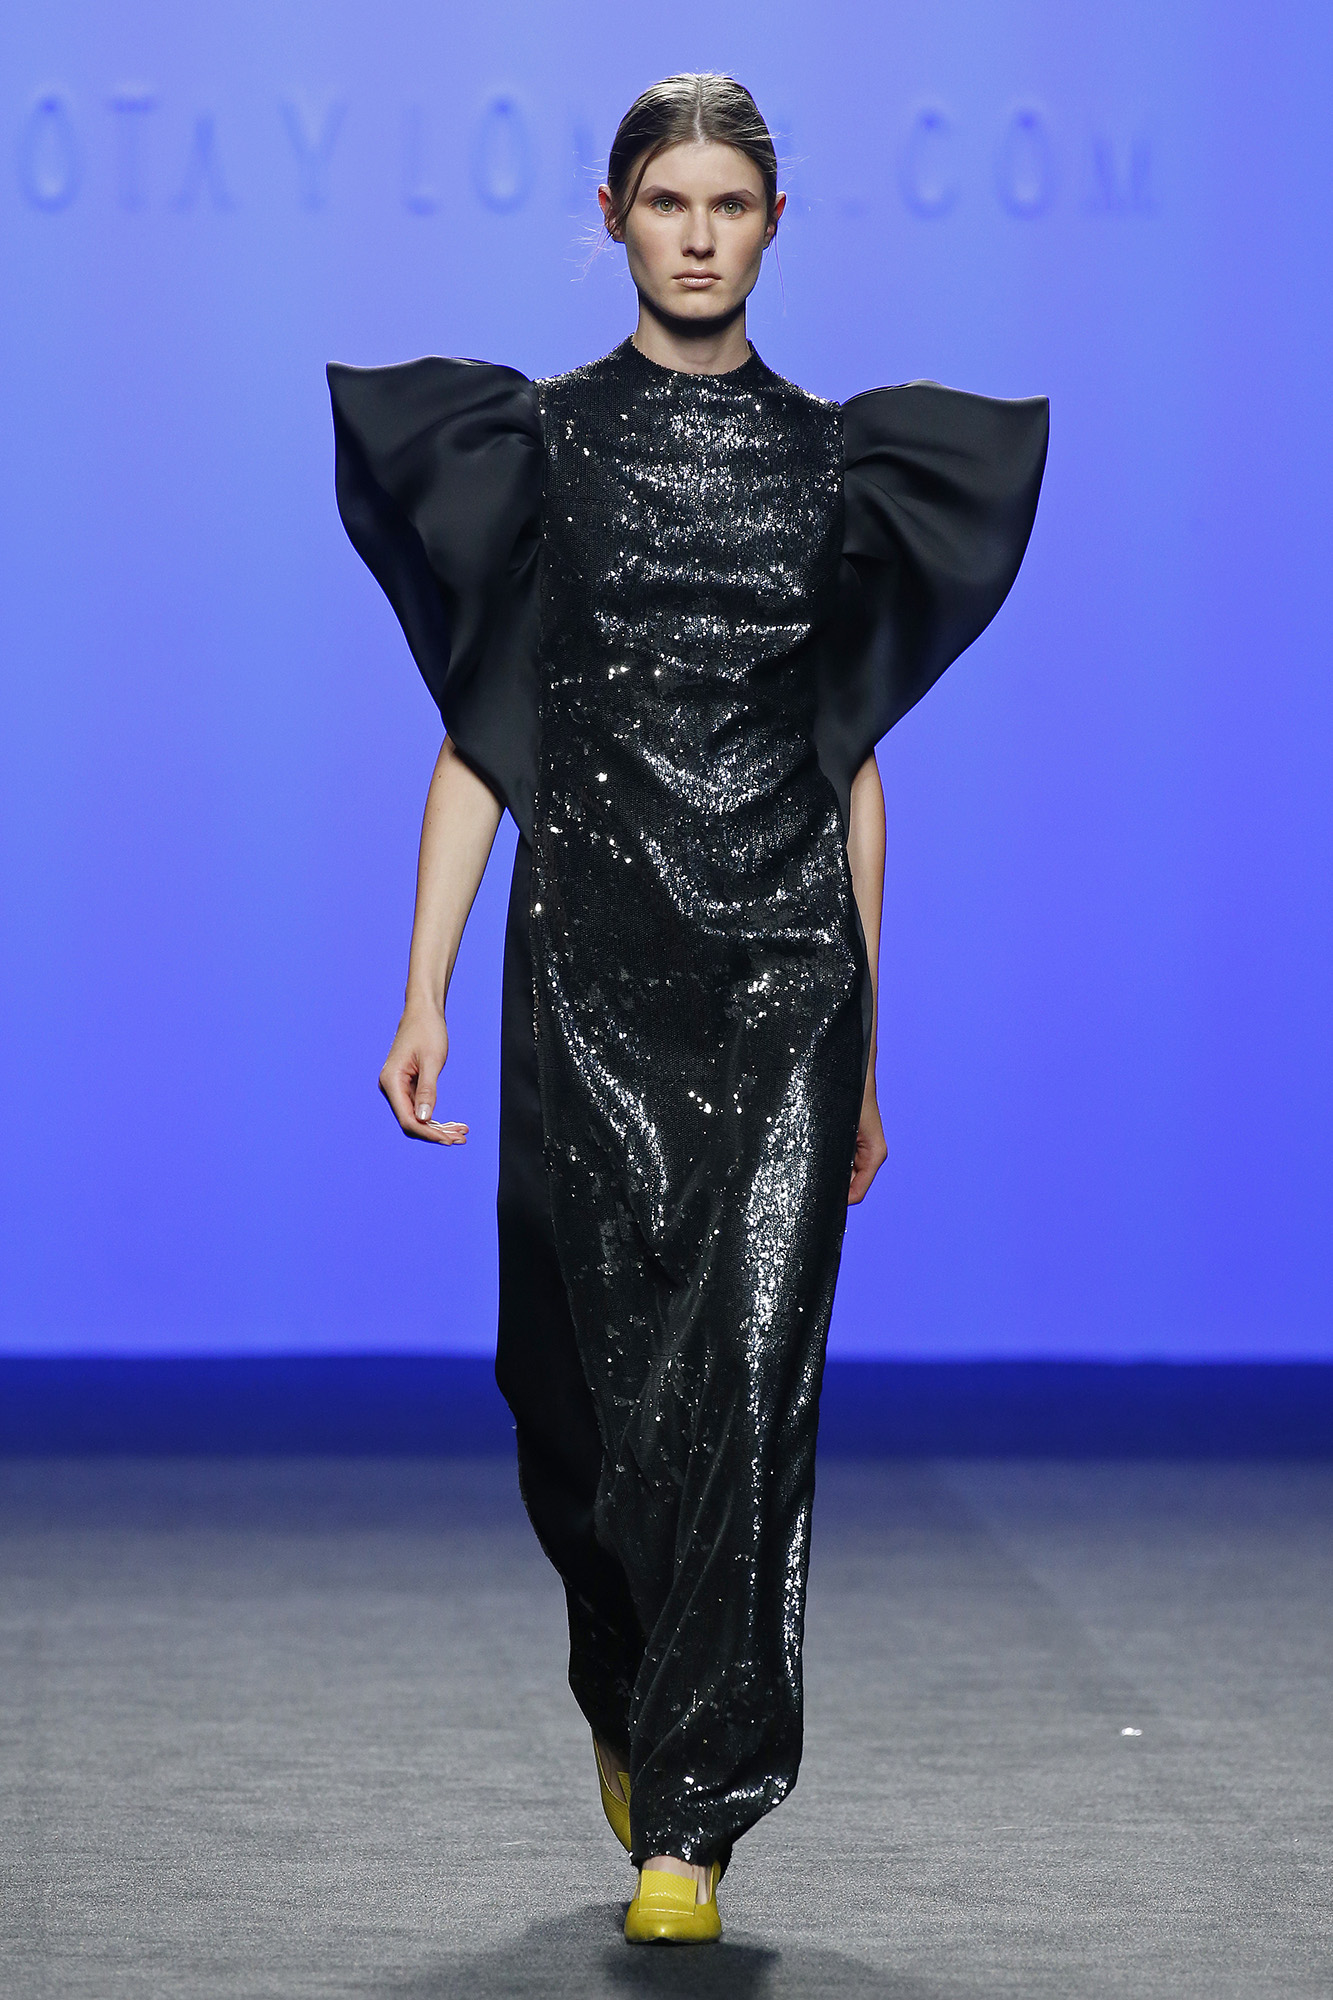 Vestido negro lentejuelas